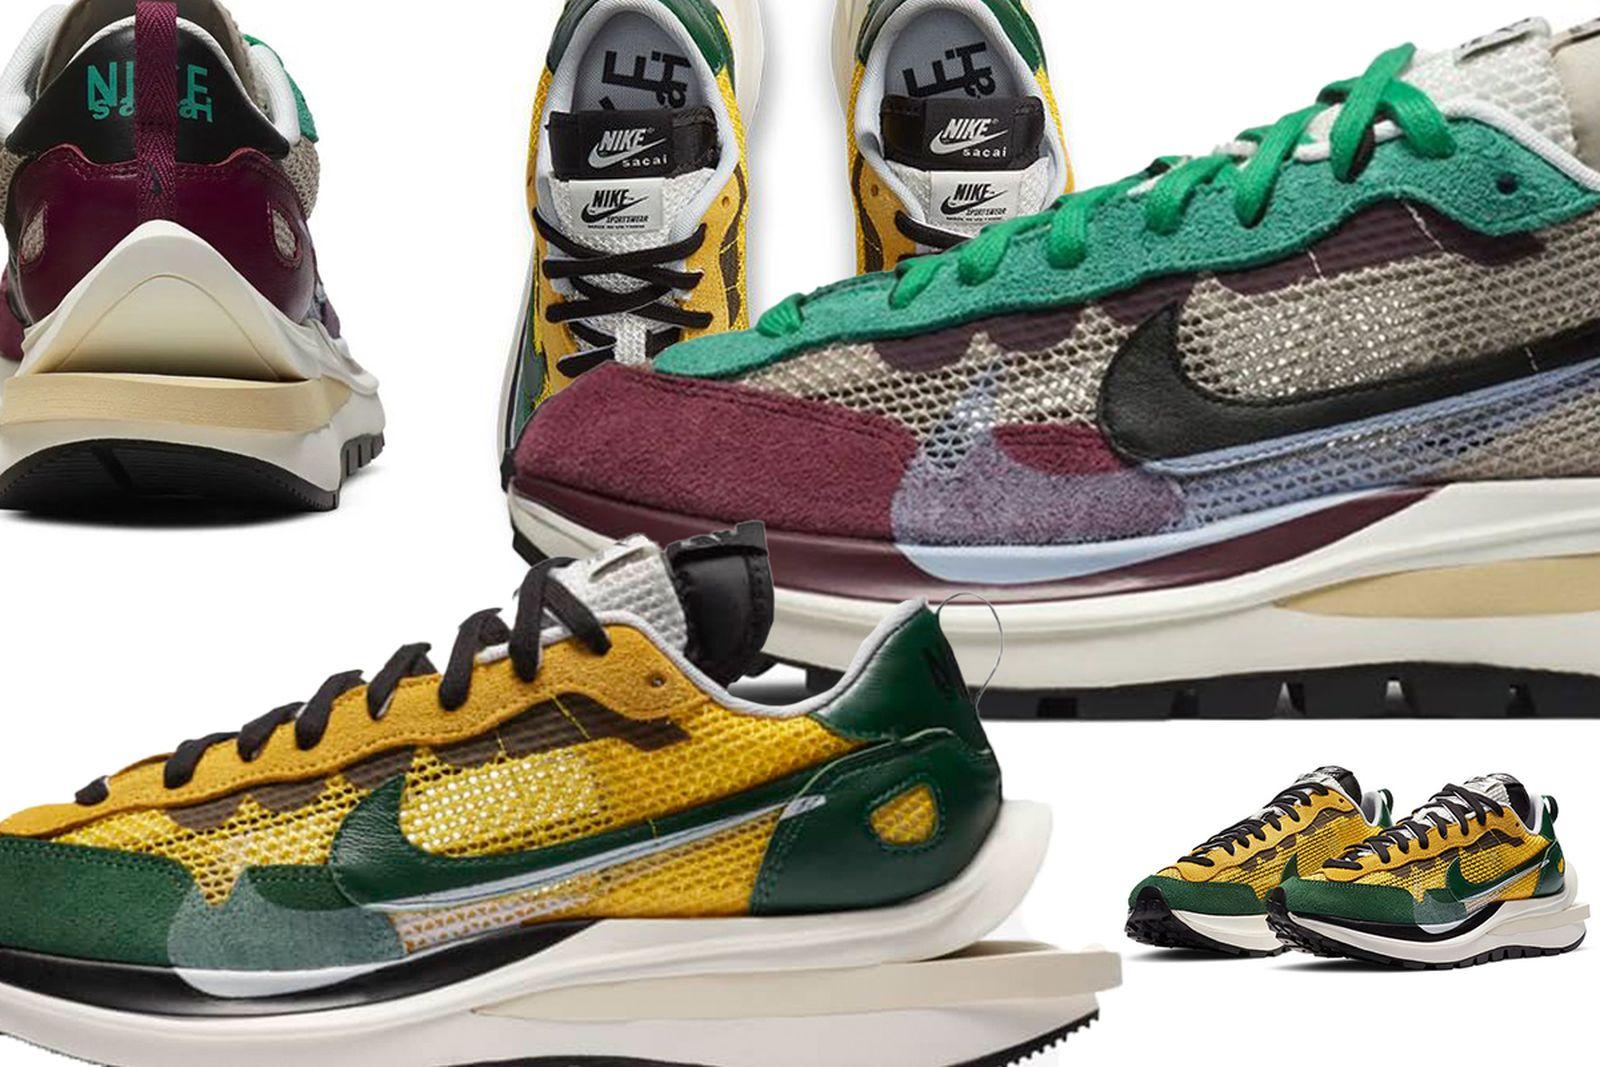 sacai x Nike VaporWaffle Drop 2: How & Where to Buy Today